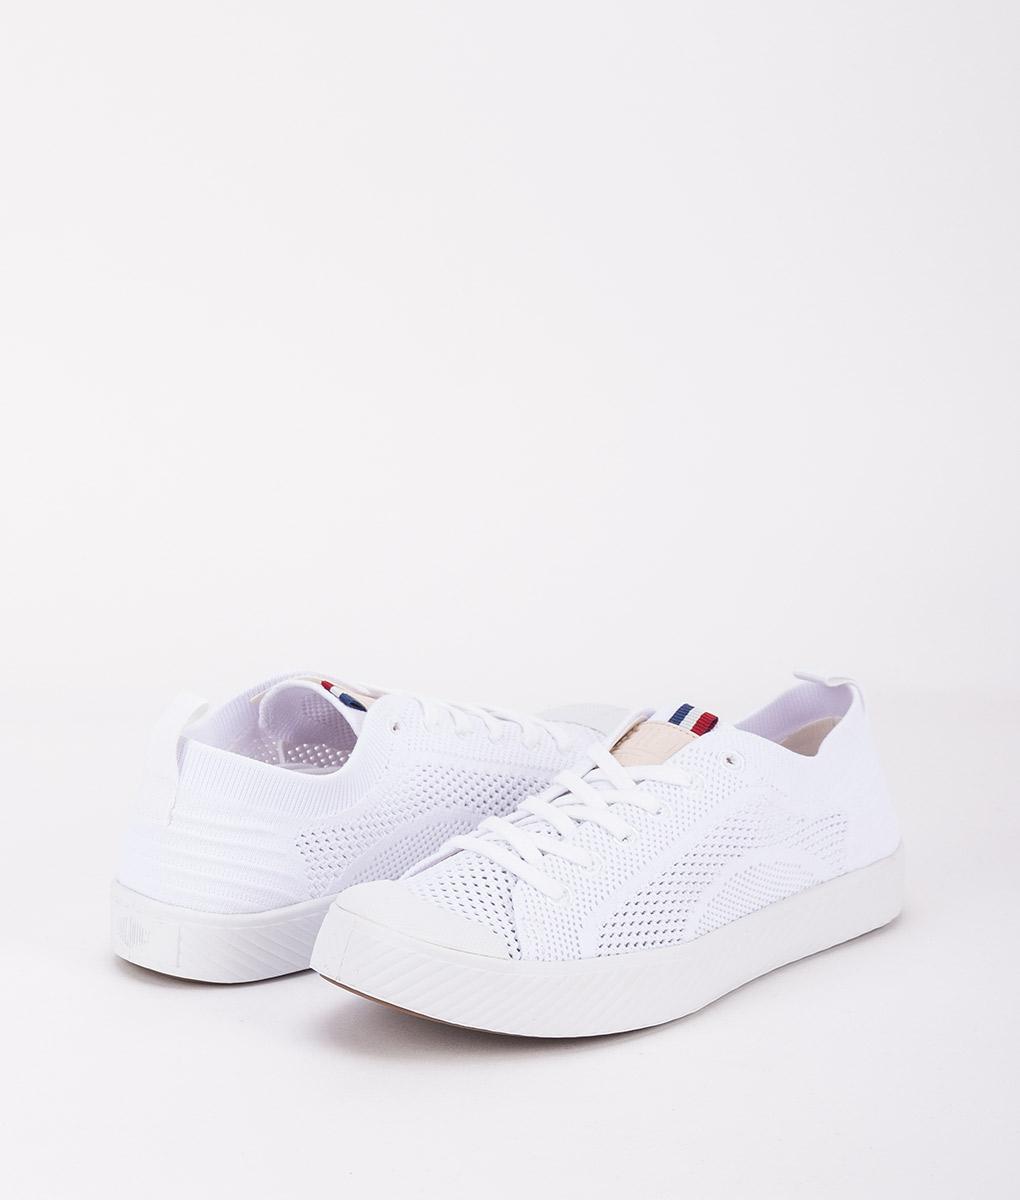 PALLADIUM Women Sneakers 75728 PALLAPHOENIX K, White 94.99